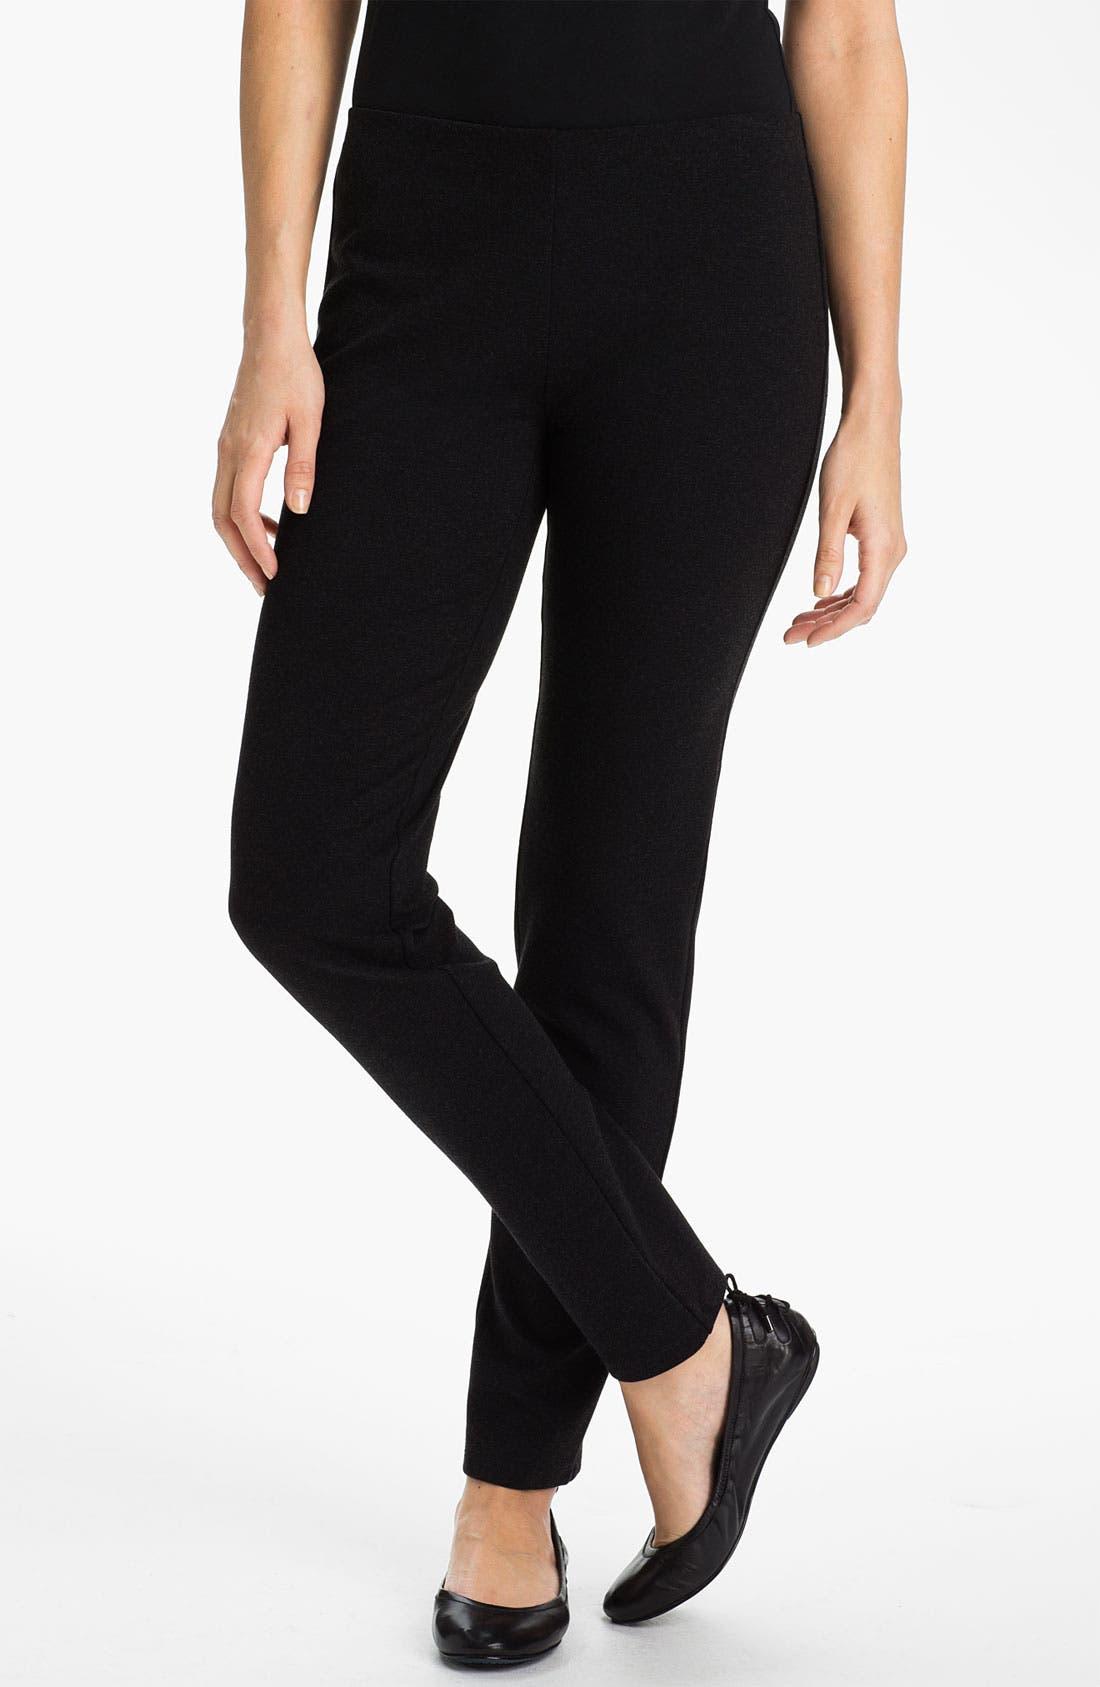 Alternate Image 1 Selected - Eileen Fisher Slim Ponte Knit Pants (Petite)